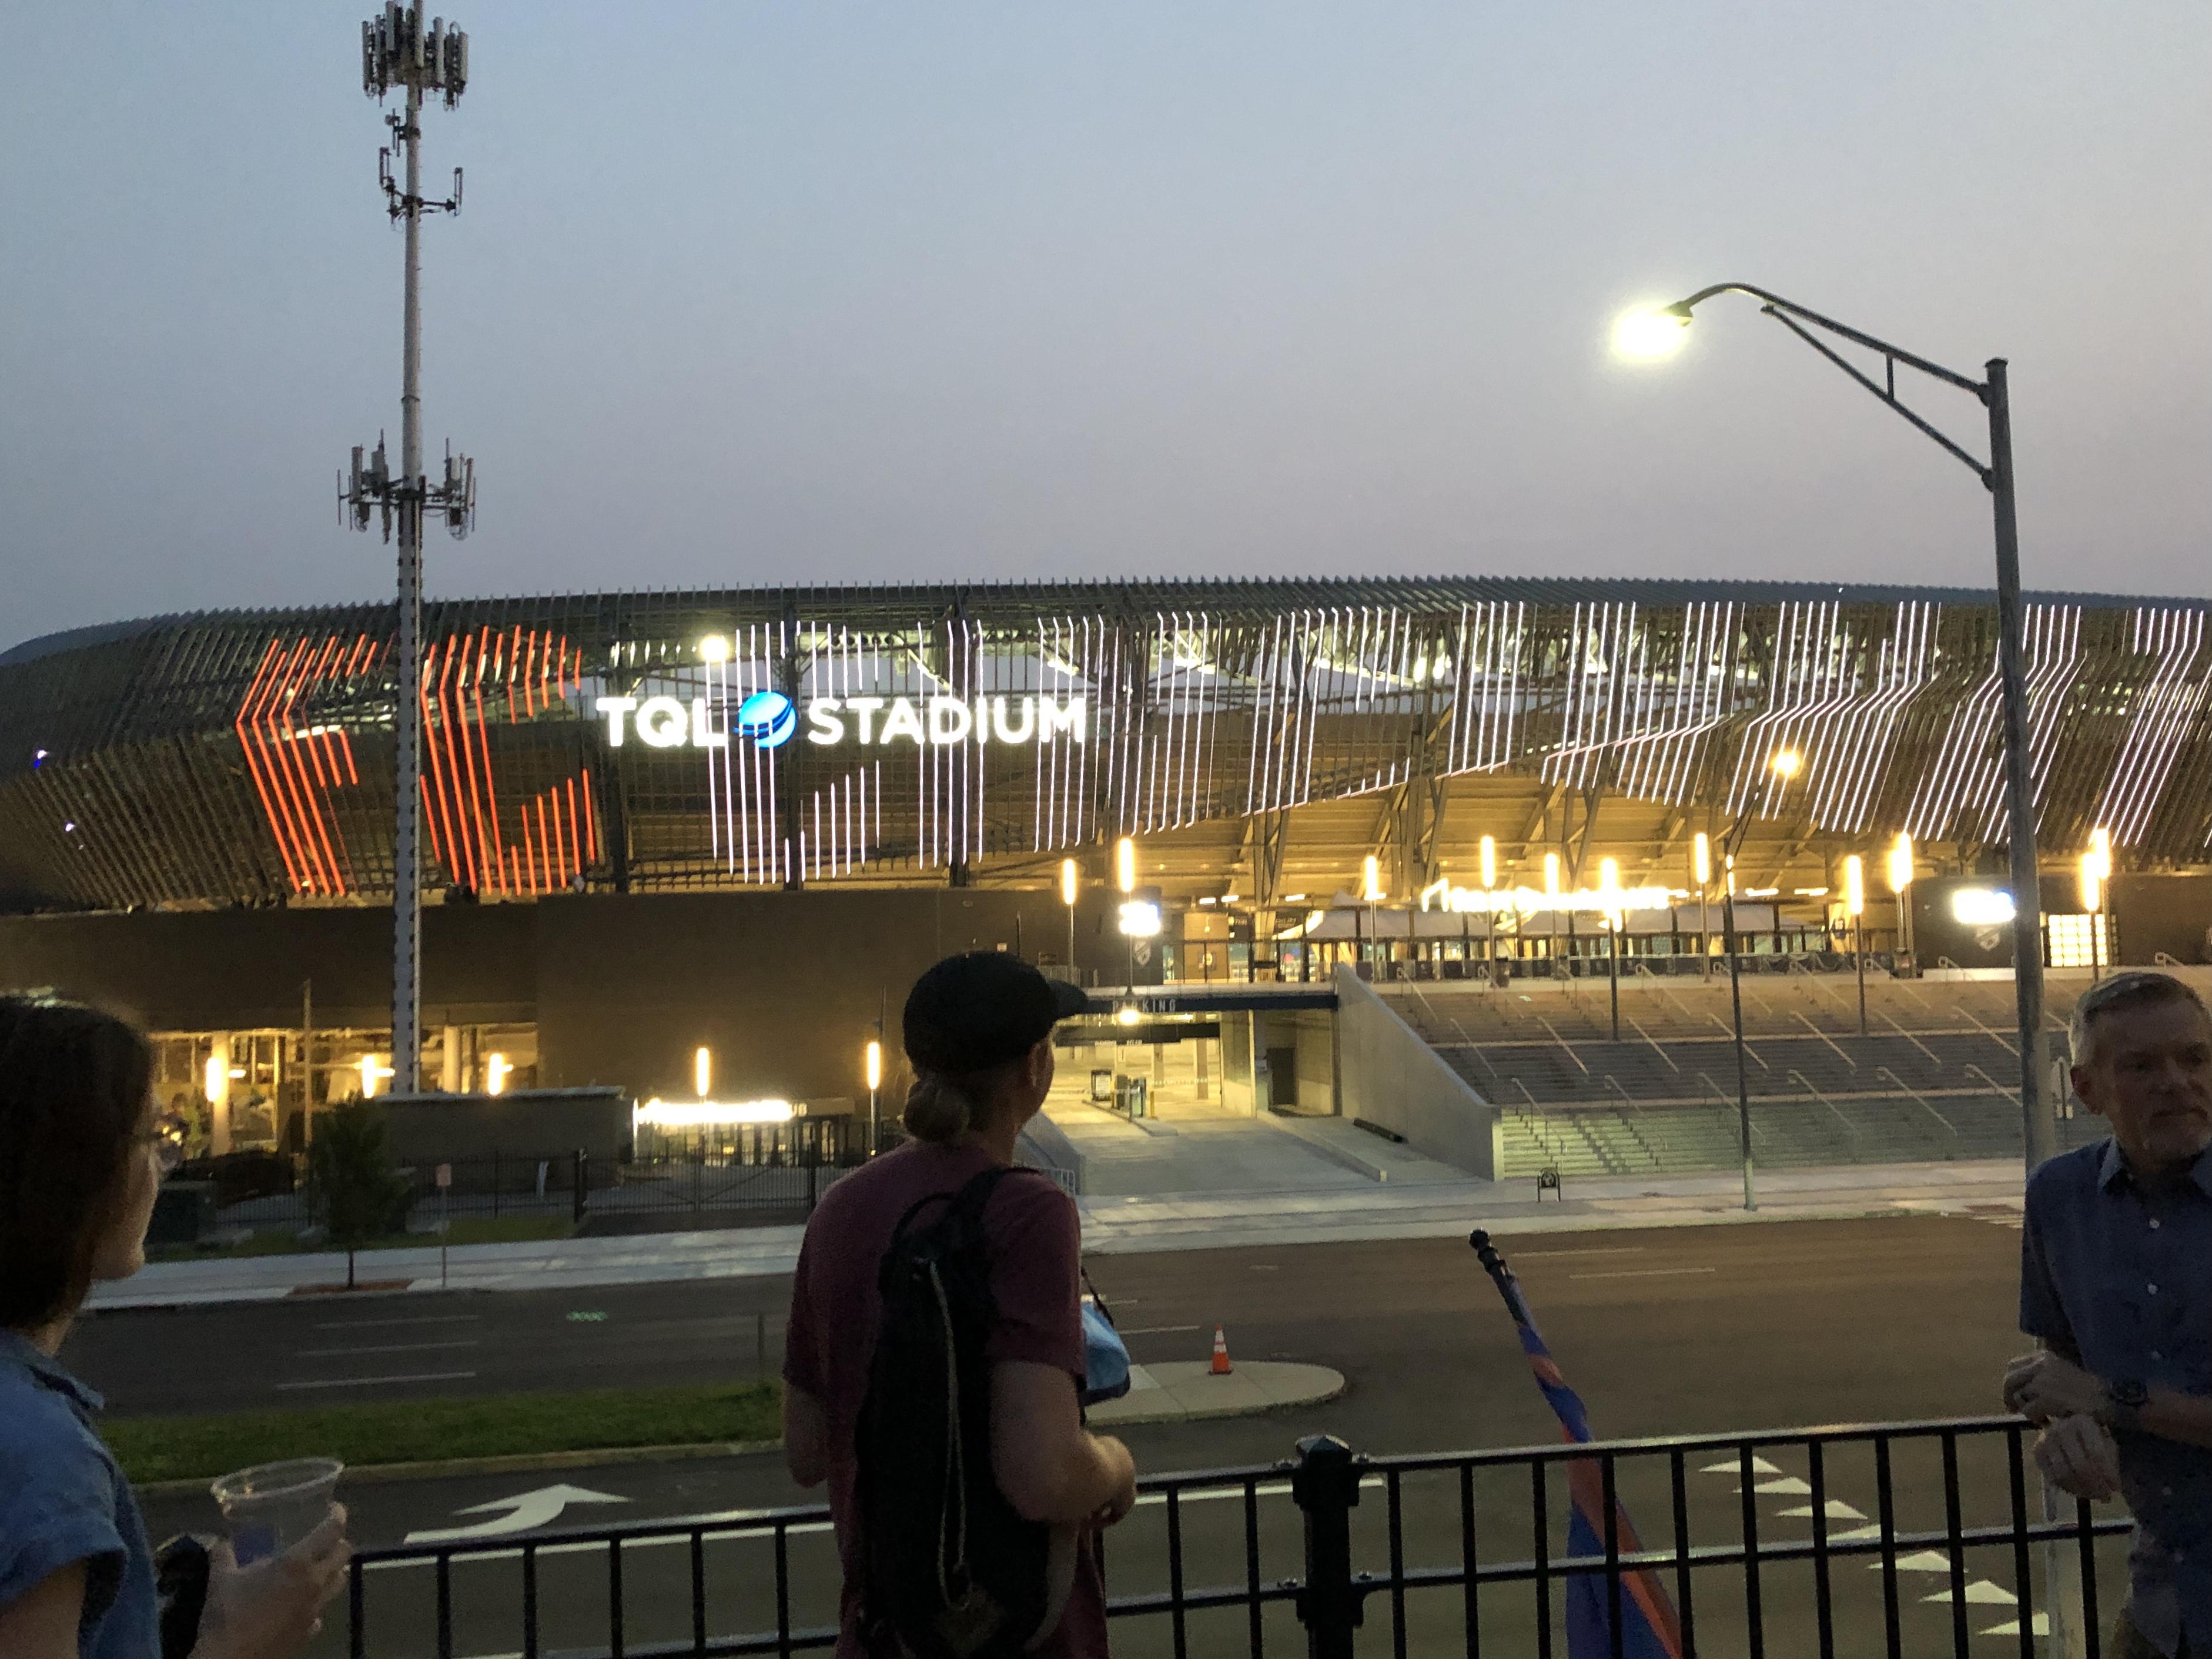 The LED fins of TQL Stadium seen at night.